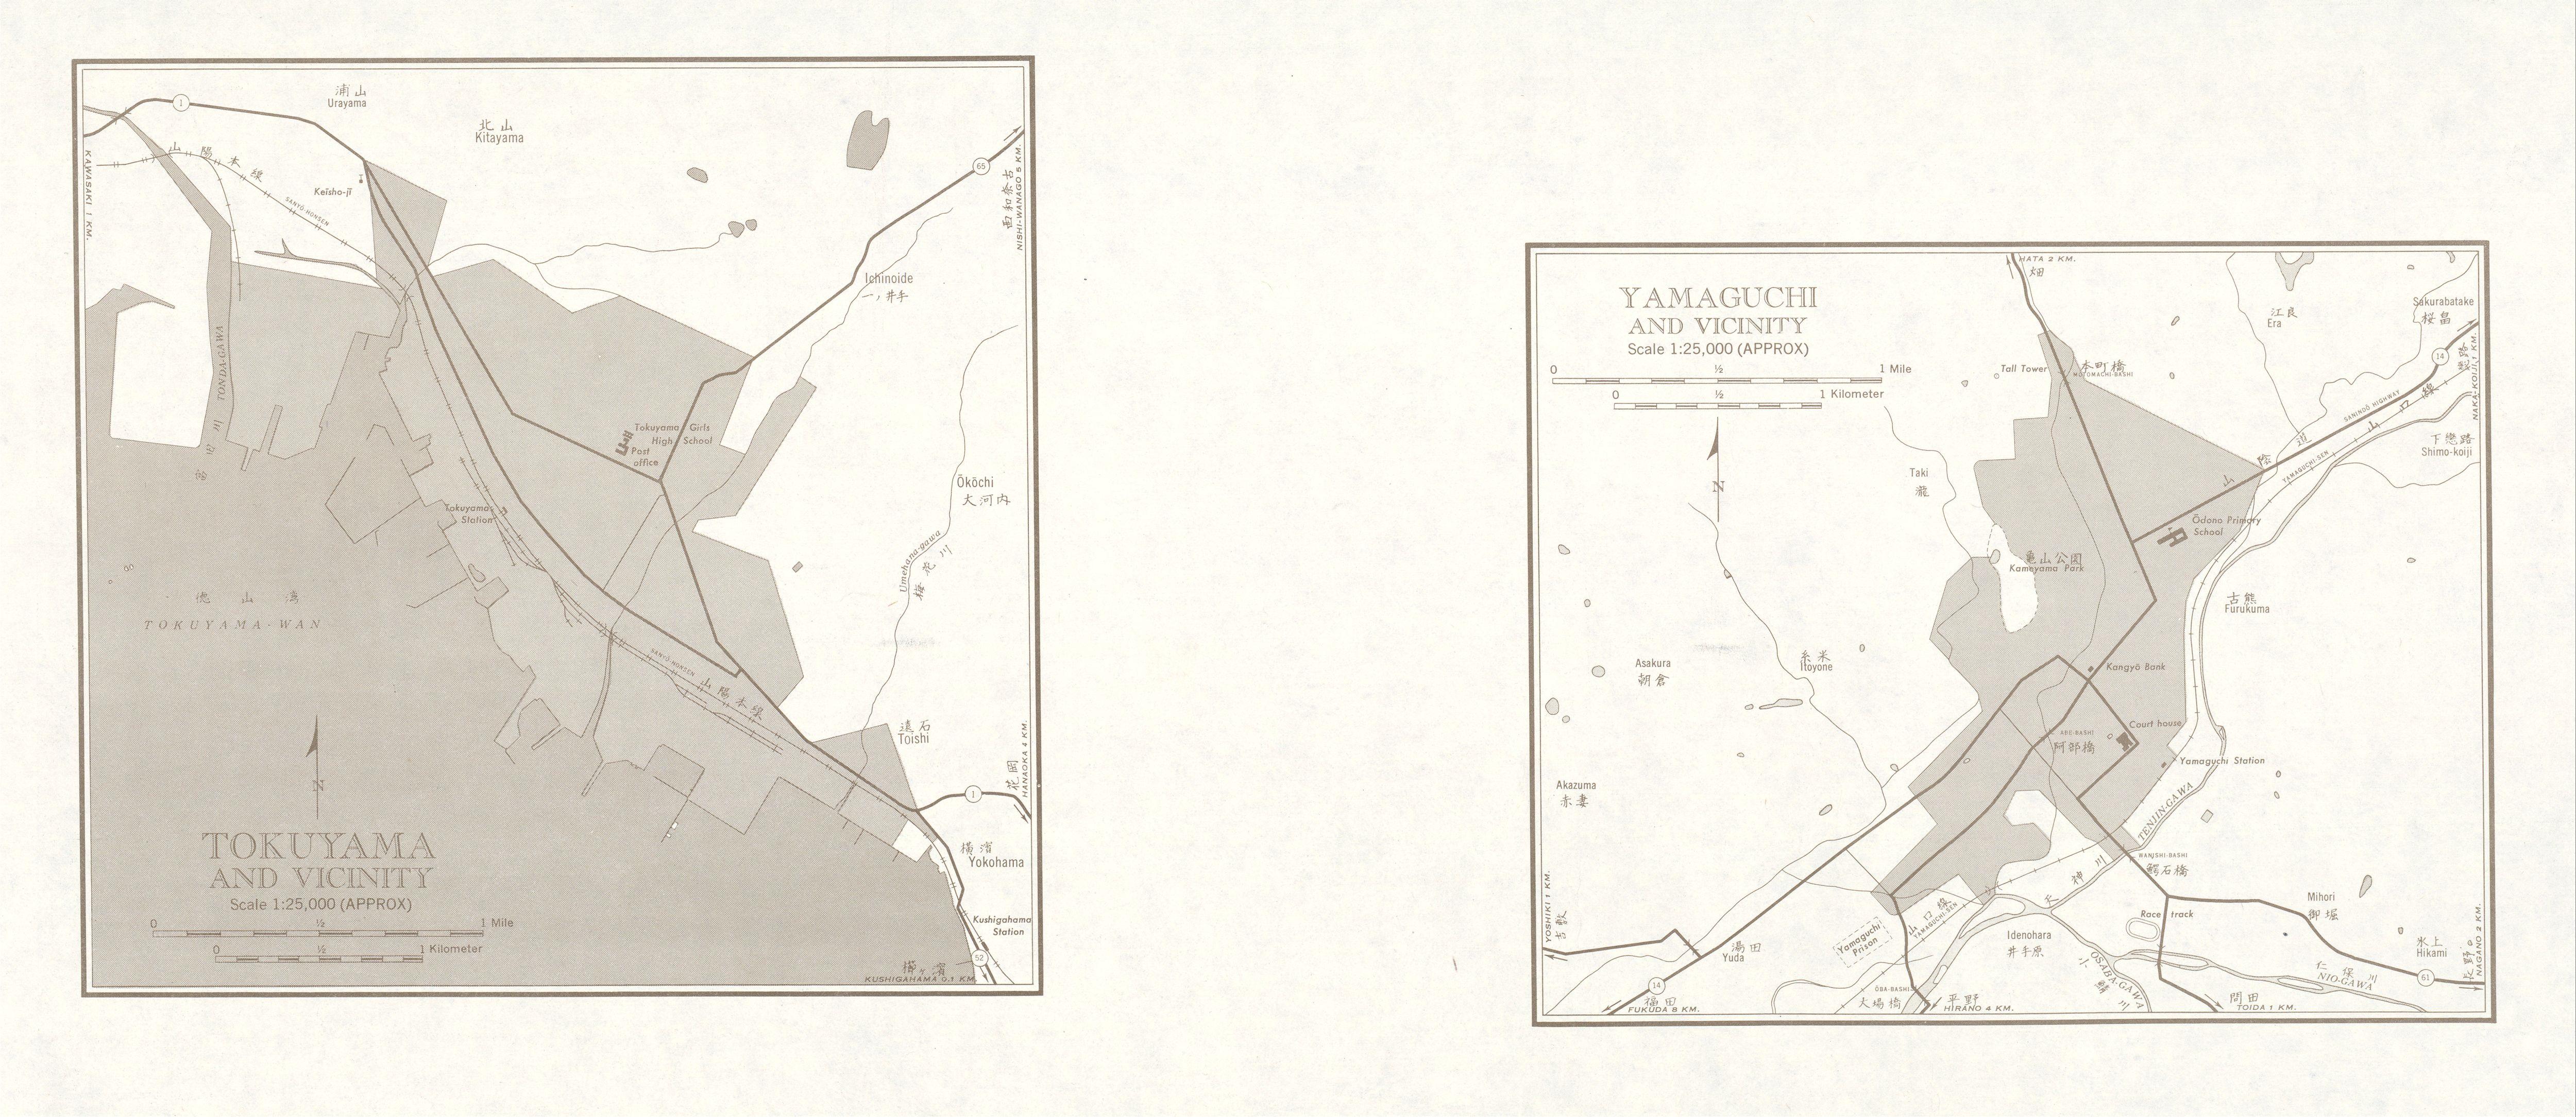 Maps of Tokuyama, Yamaguchi and their Vicinities, Japan 1954